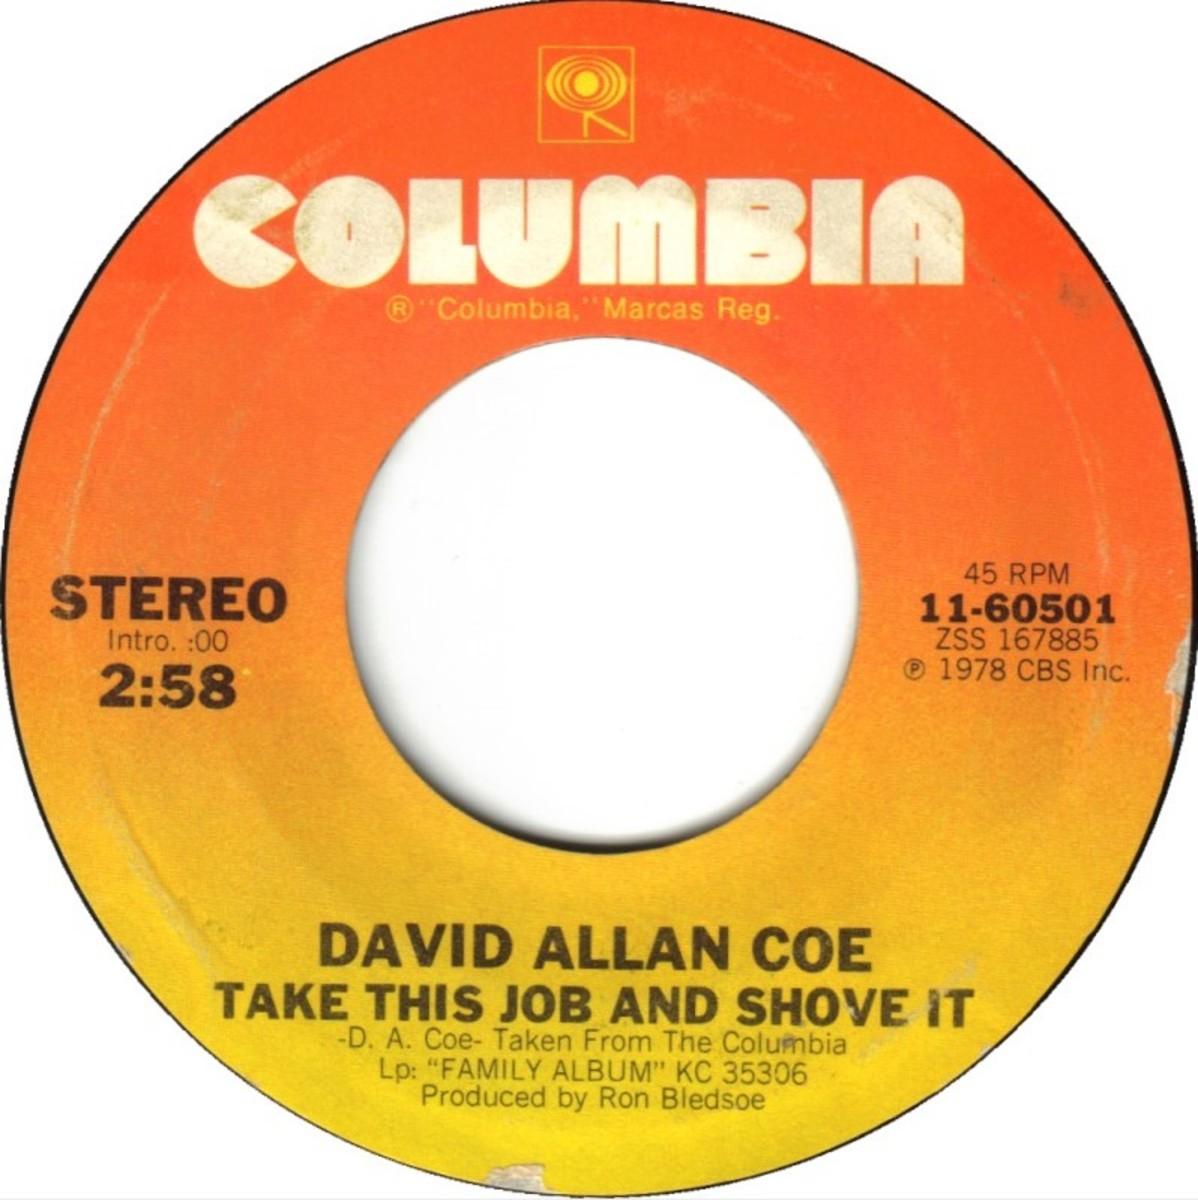 David Allan Coe flip side